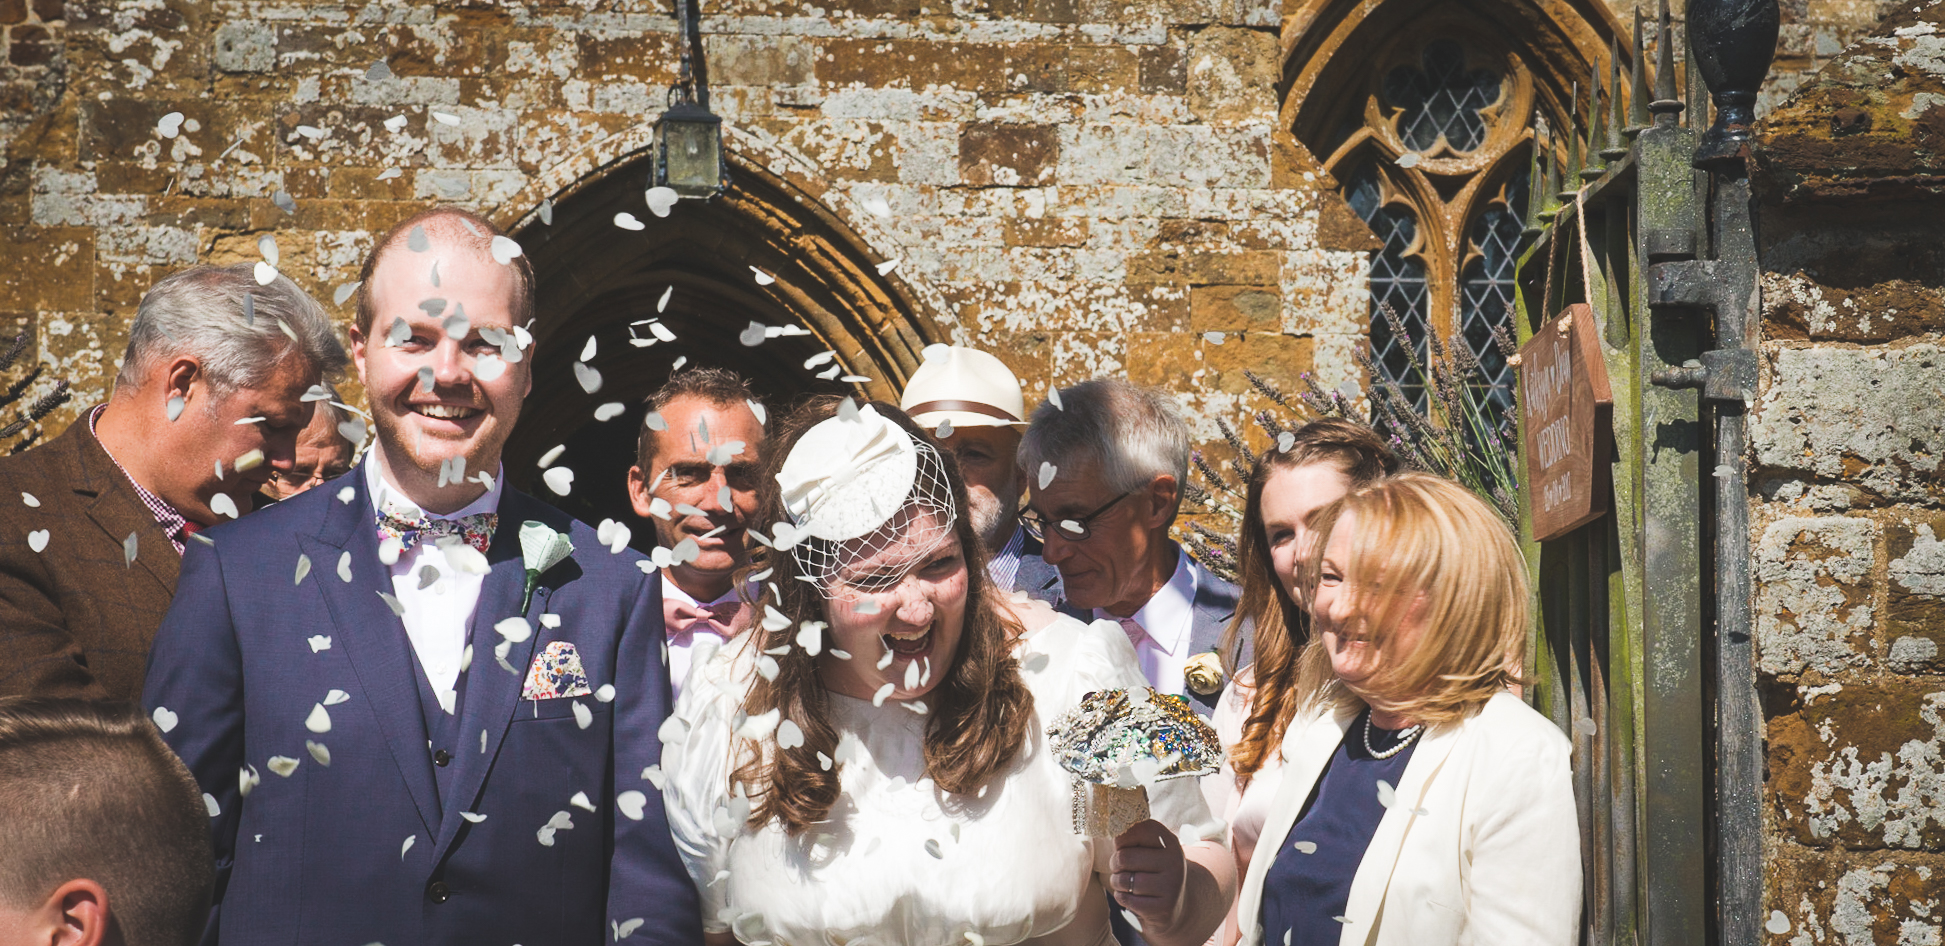 Bride and groom, confetti, culworth church, oxfordshire weddings, happy, love brooch bouquet